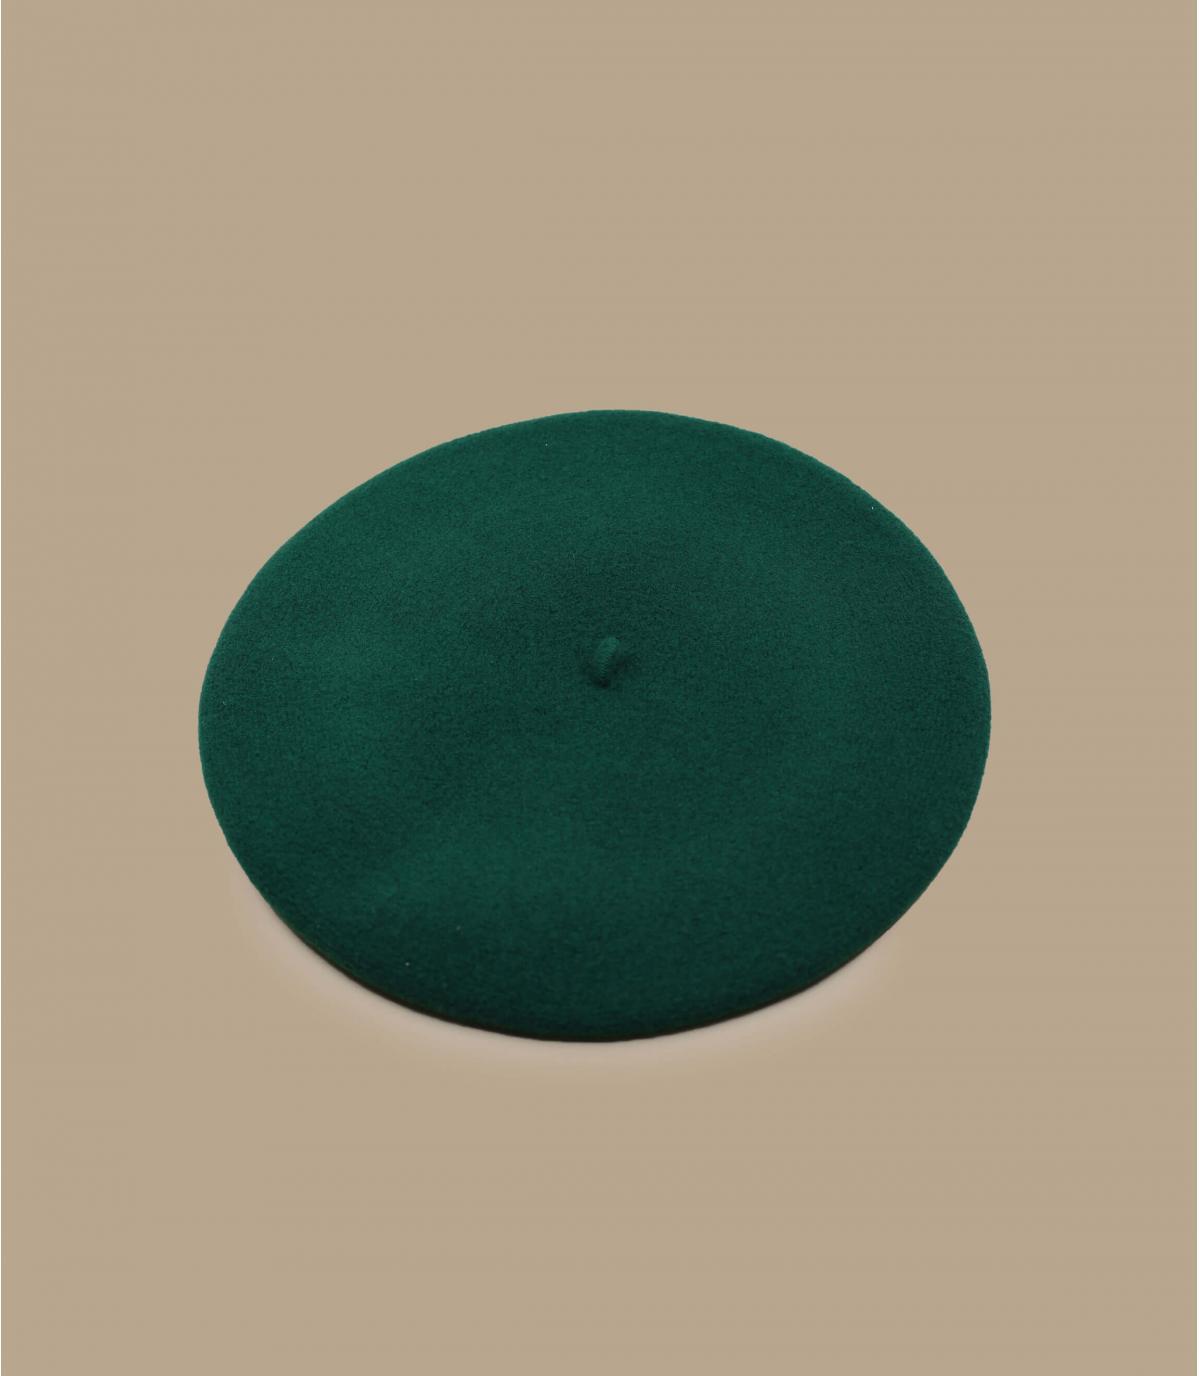 Berretto verde Laulhère